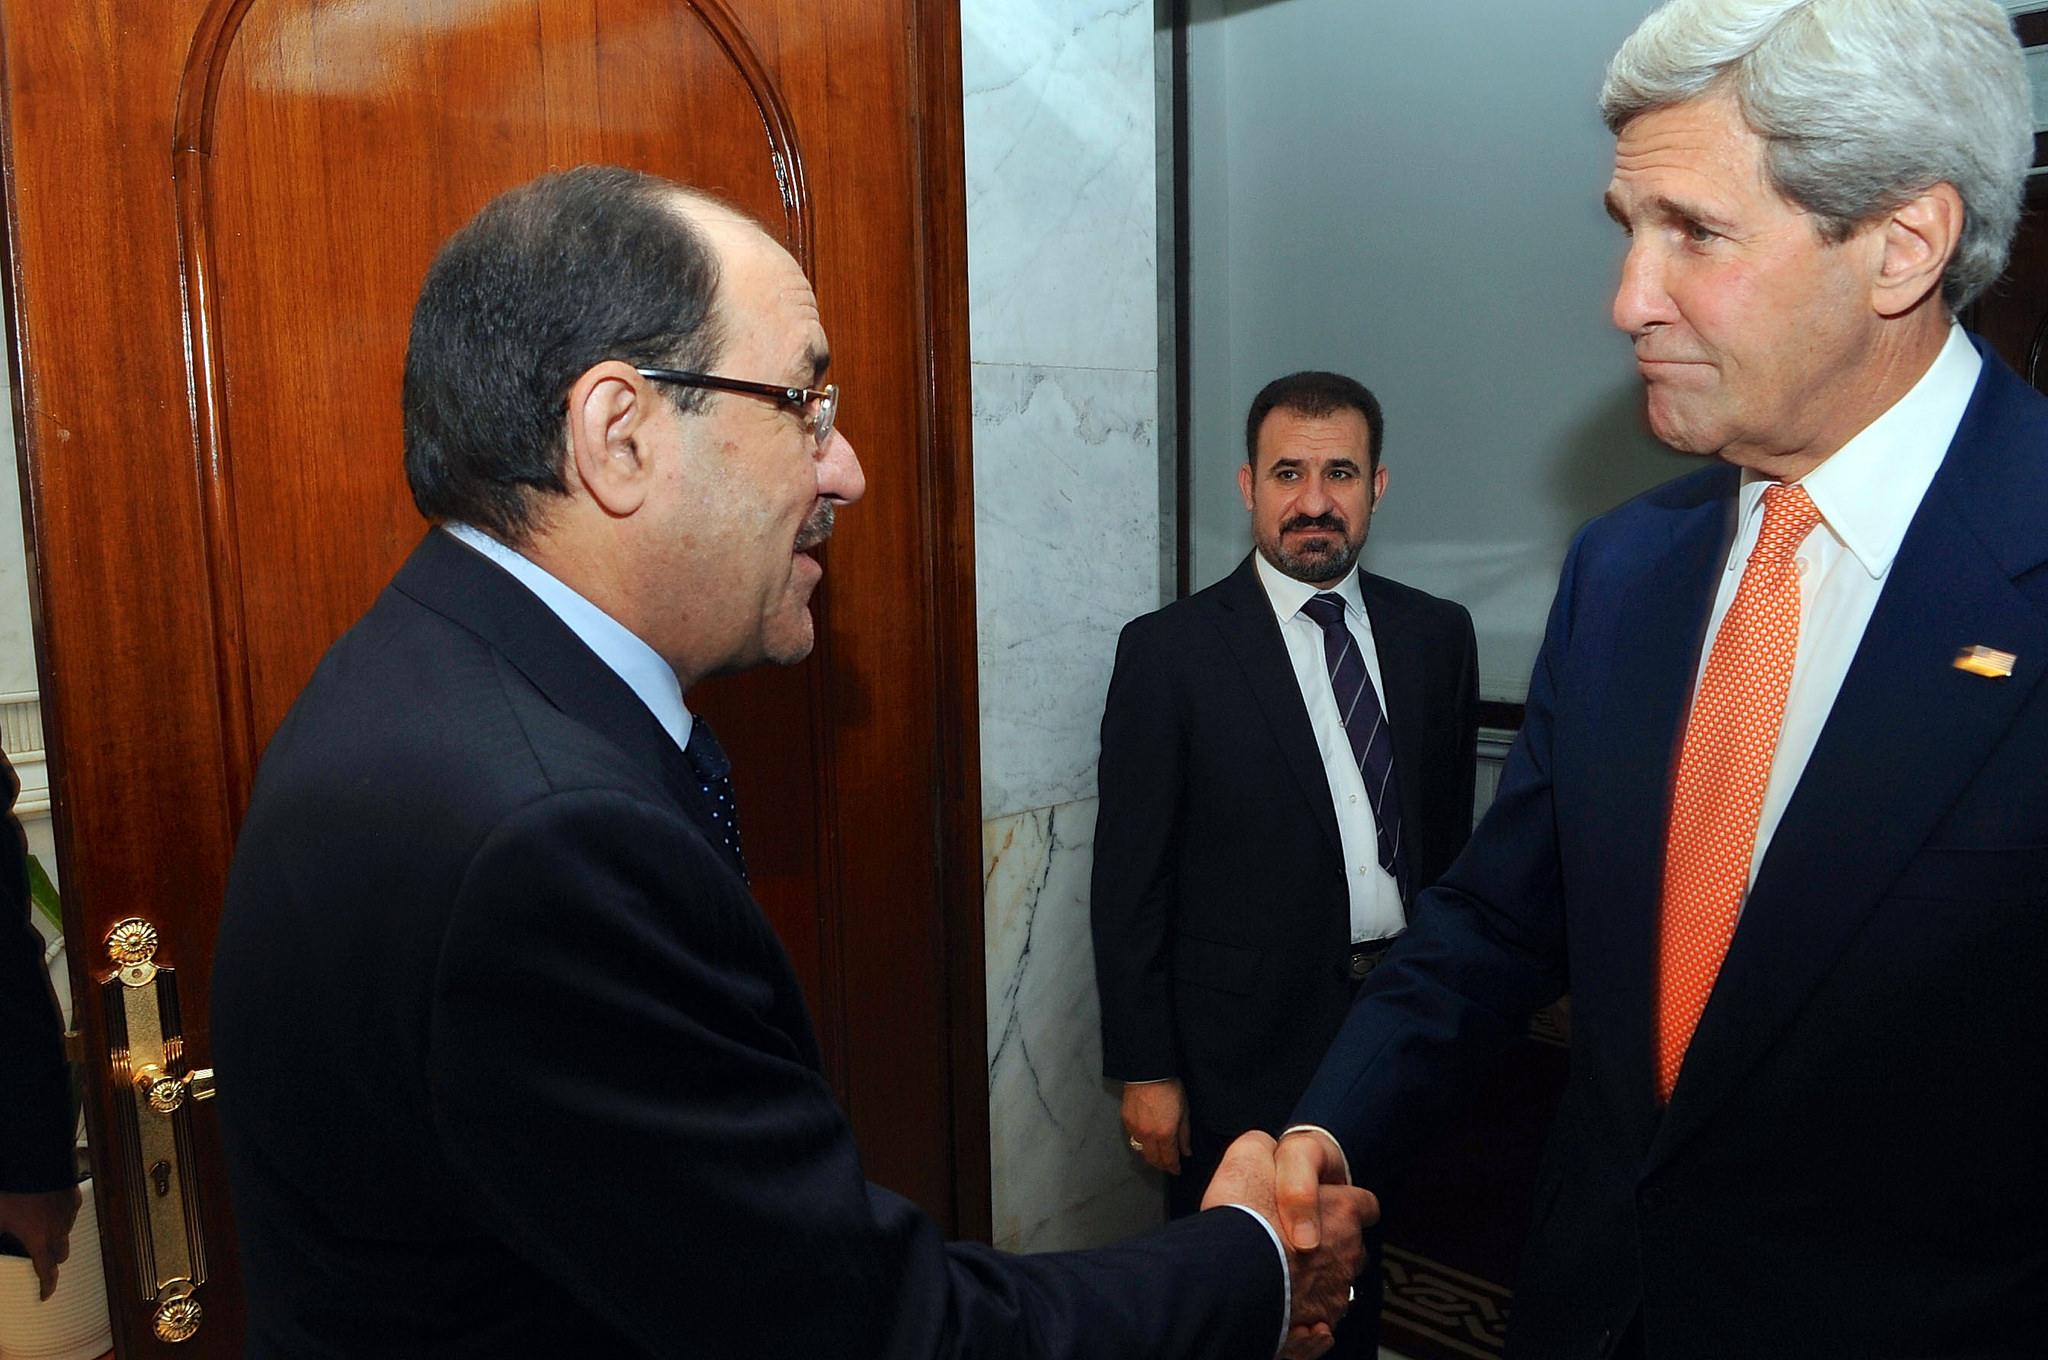 Maliki Big Loser in the Blame Game